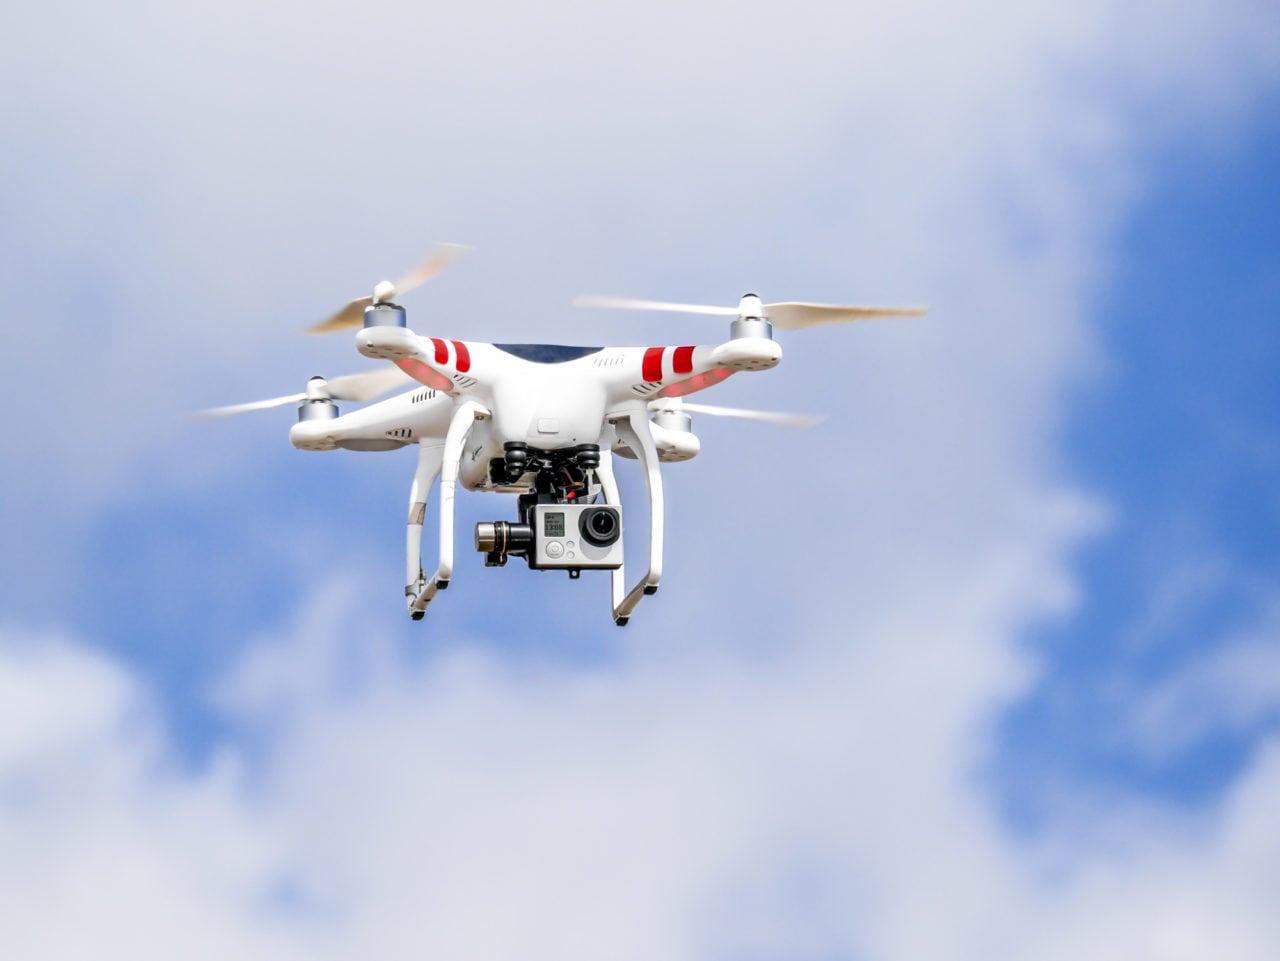 Small unmanned aircraft system. Photo: Auburn University